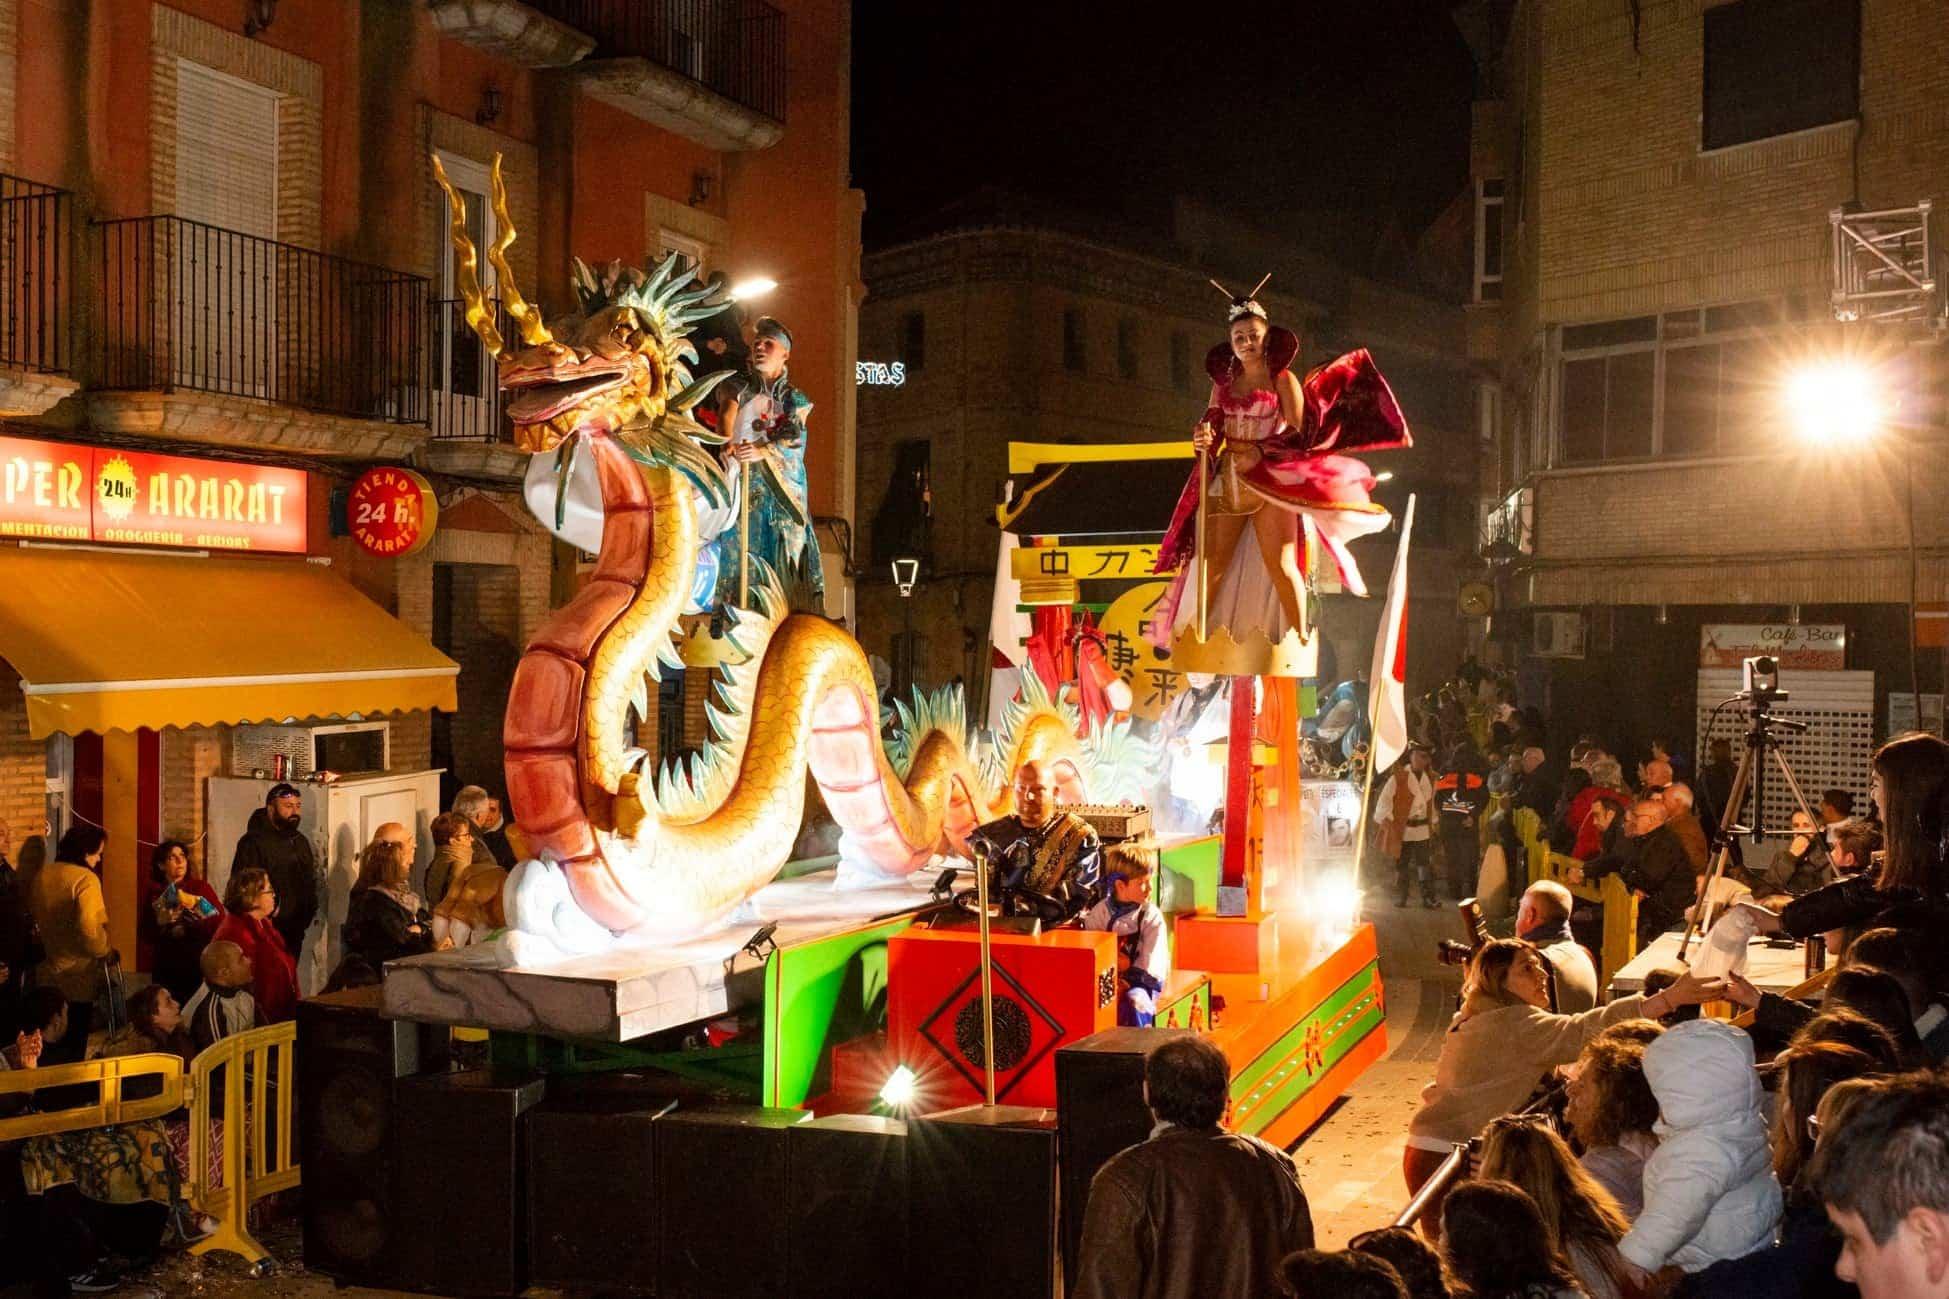 Carnaval de herencia 2020 ofertorio 133 - Selección de fotografías del Ofertorio del Carnaval de Herencia